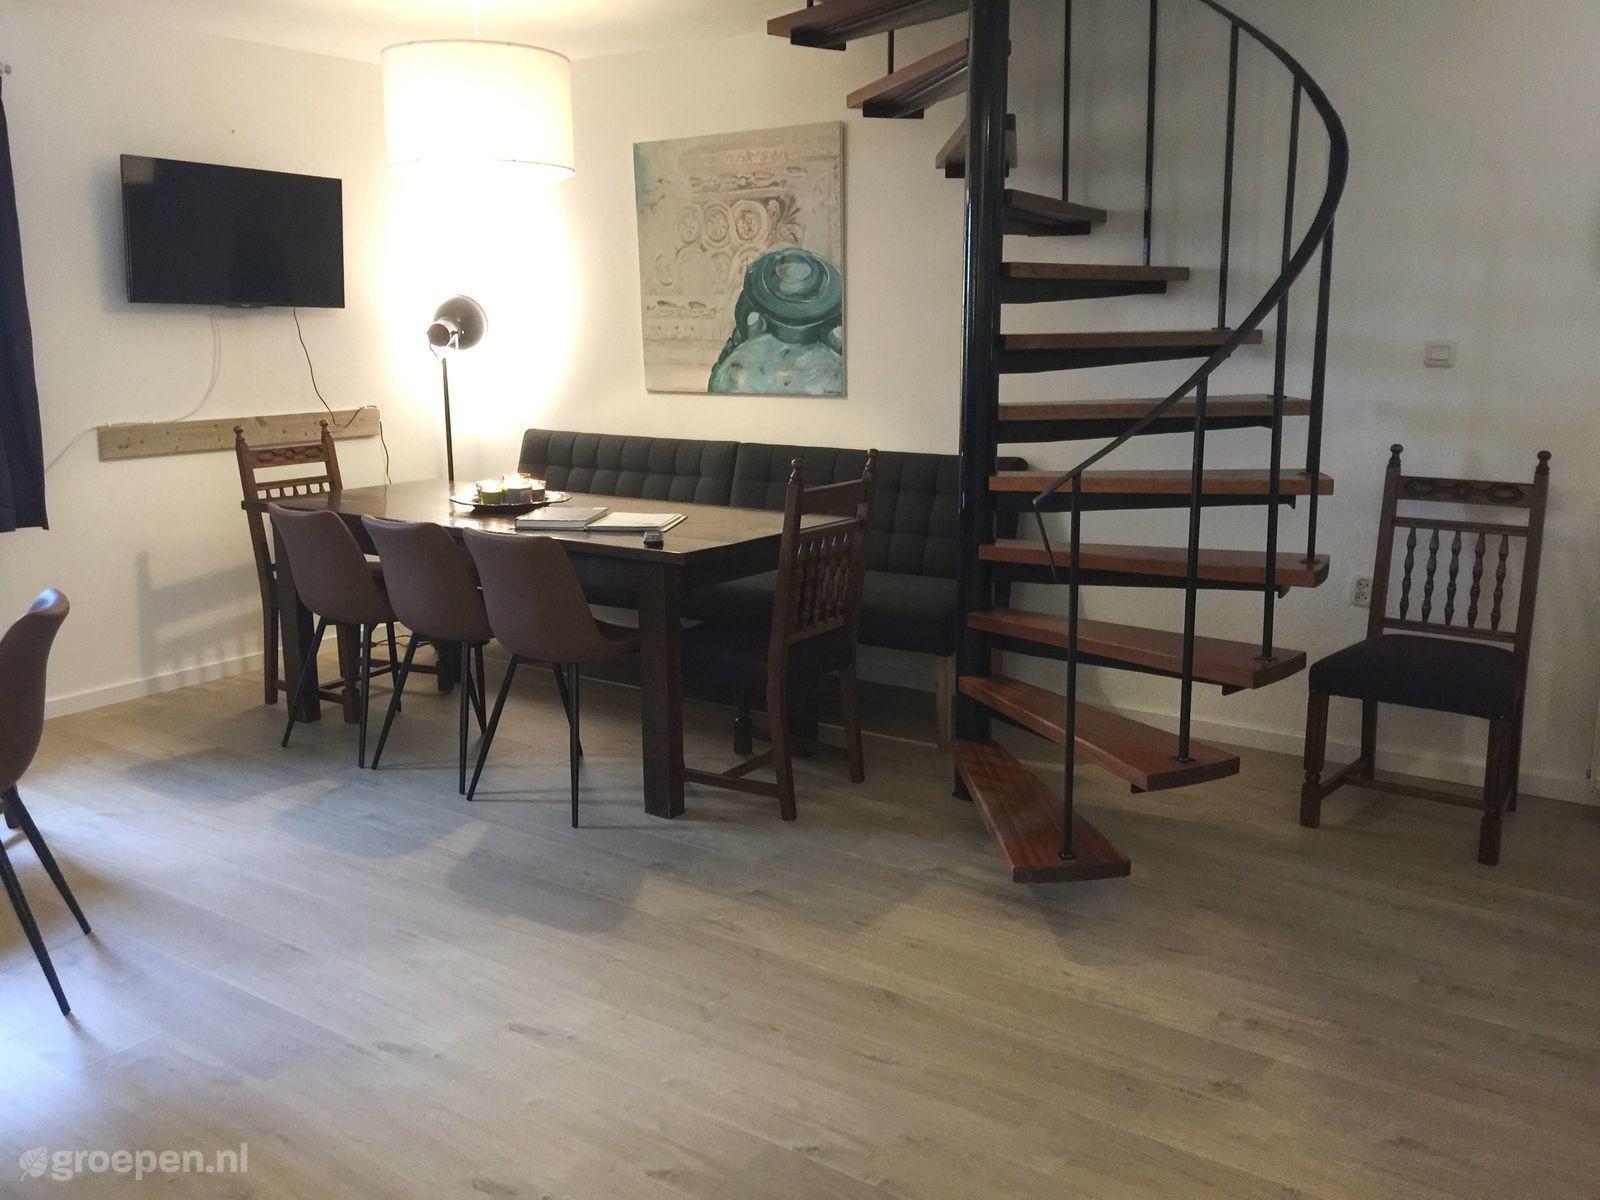 hardwood floor refinishing grand forks nd of group accommodations in limburg groepen nl regarding bocholtz